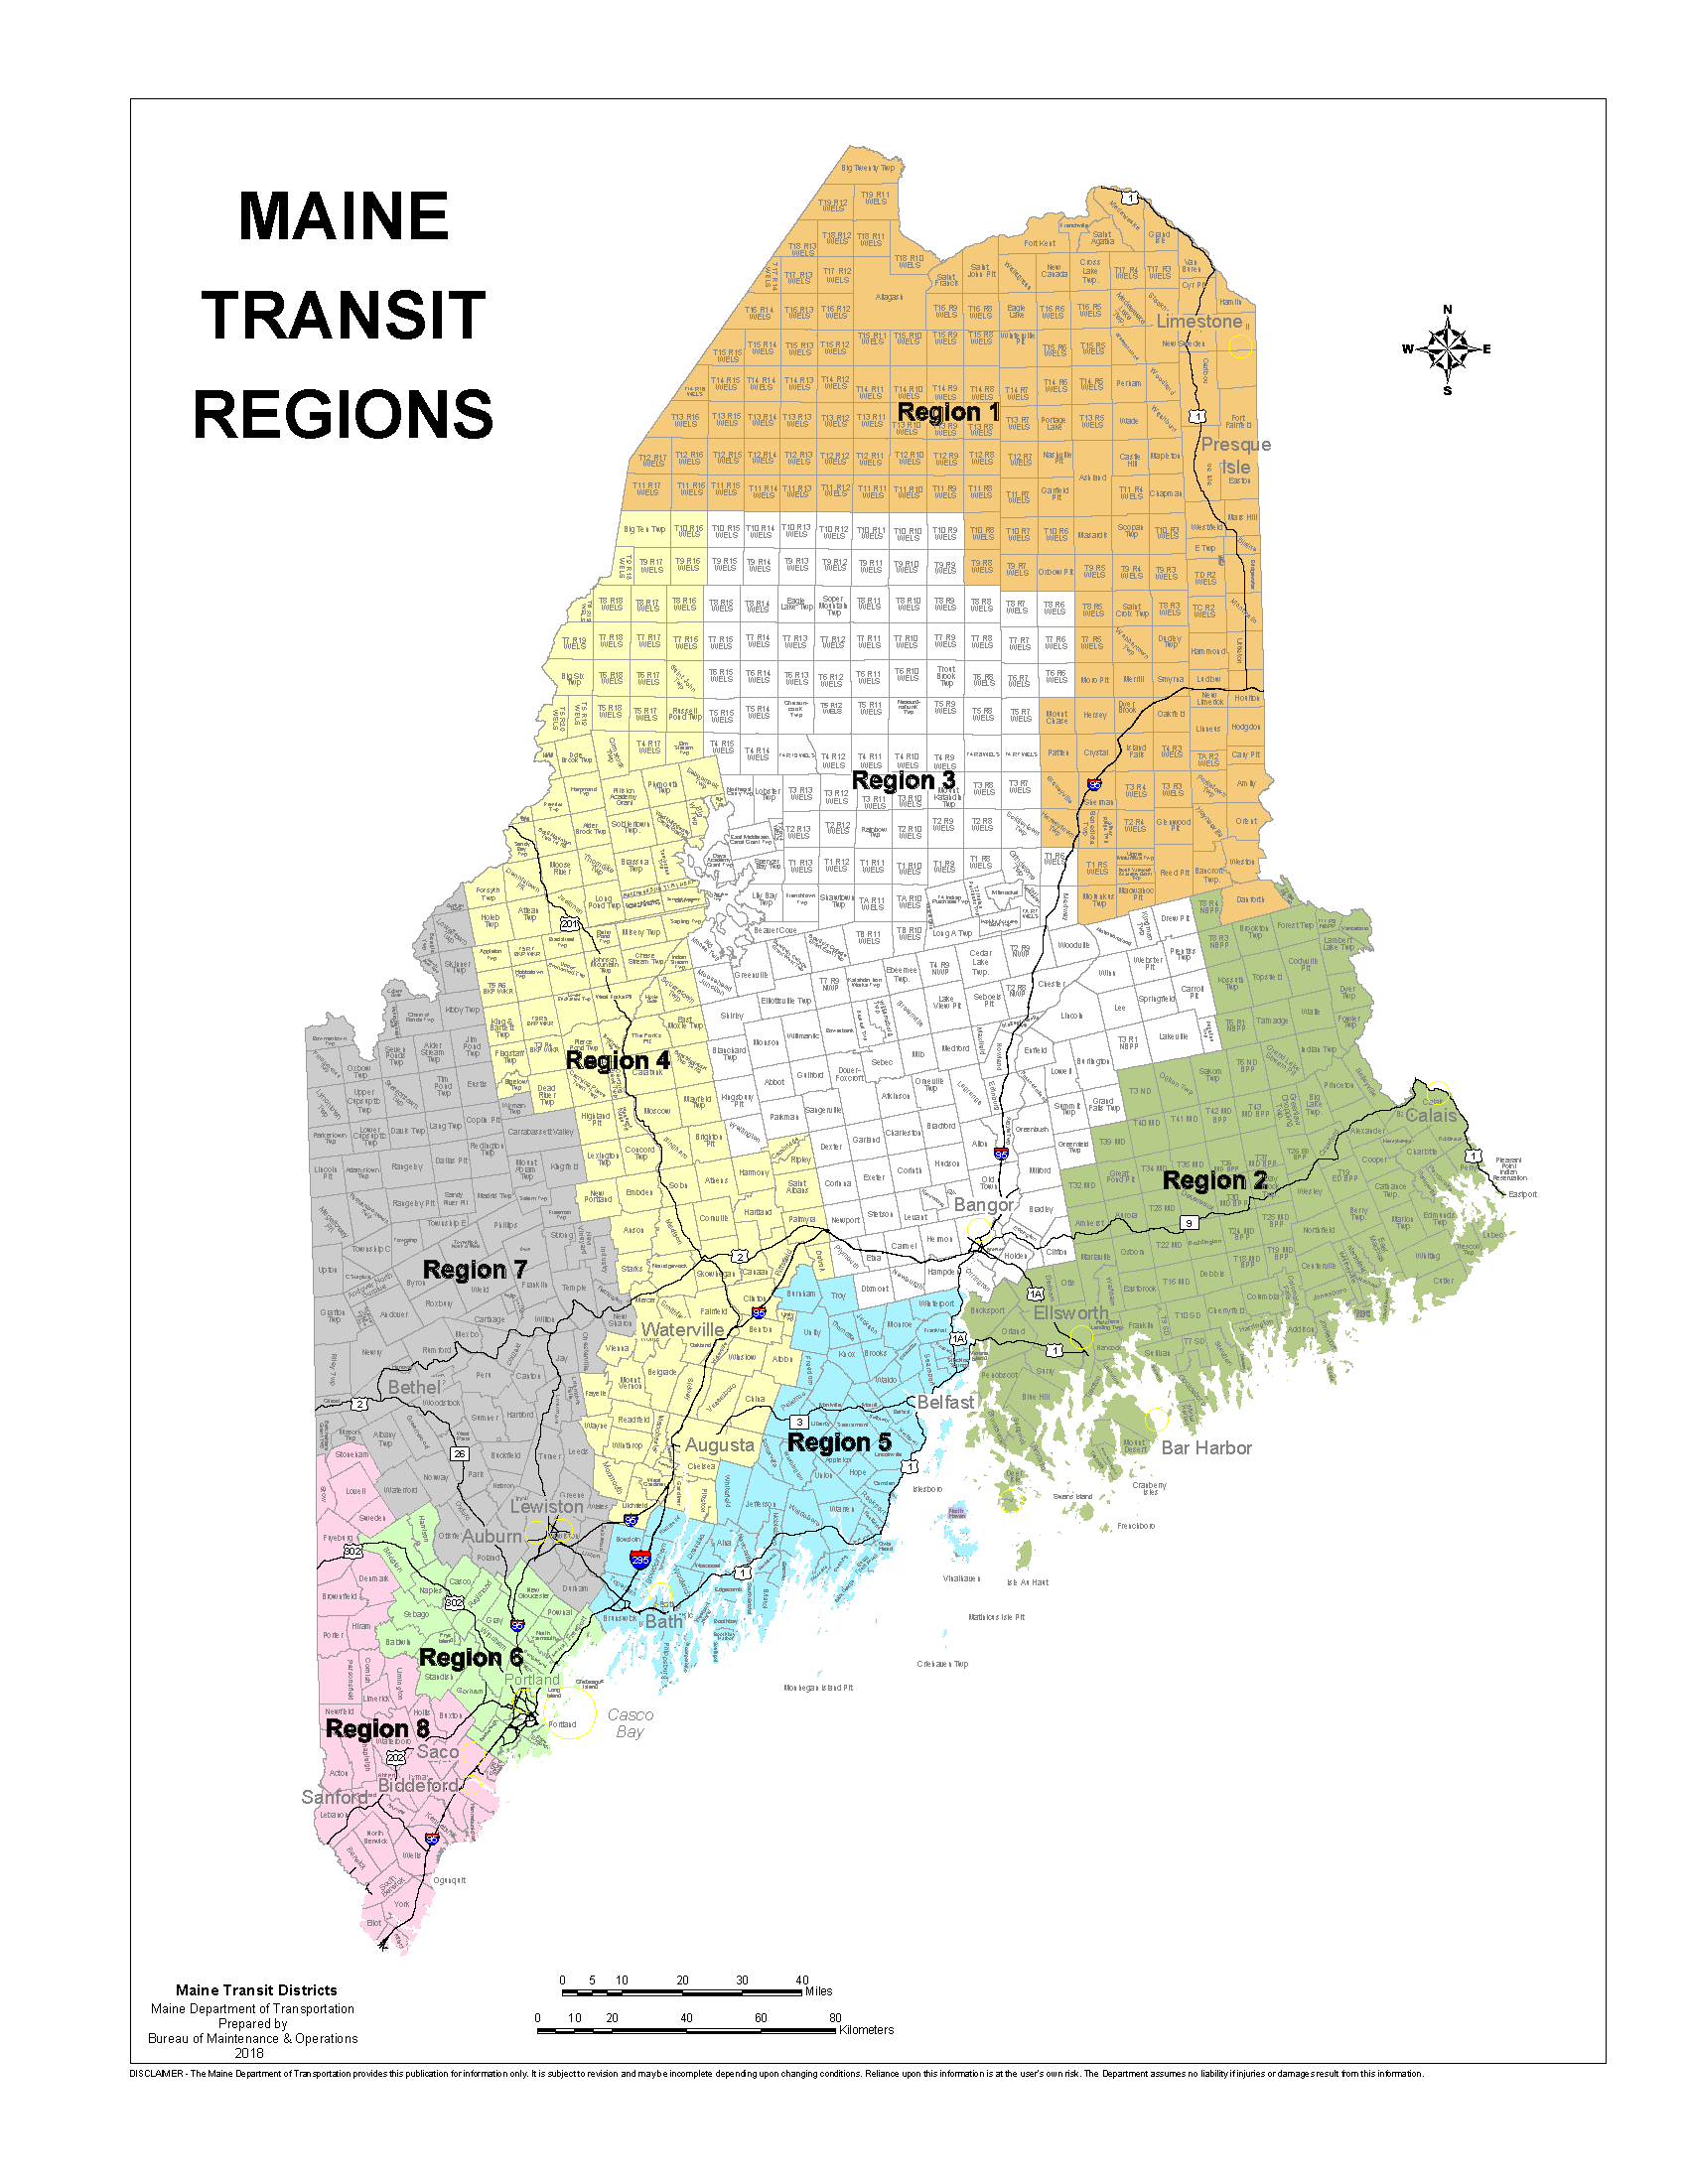 Public Transit Mainedot